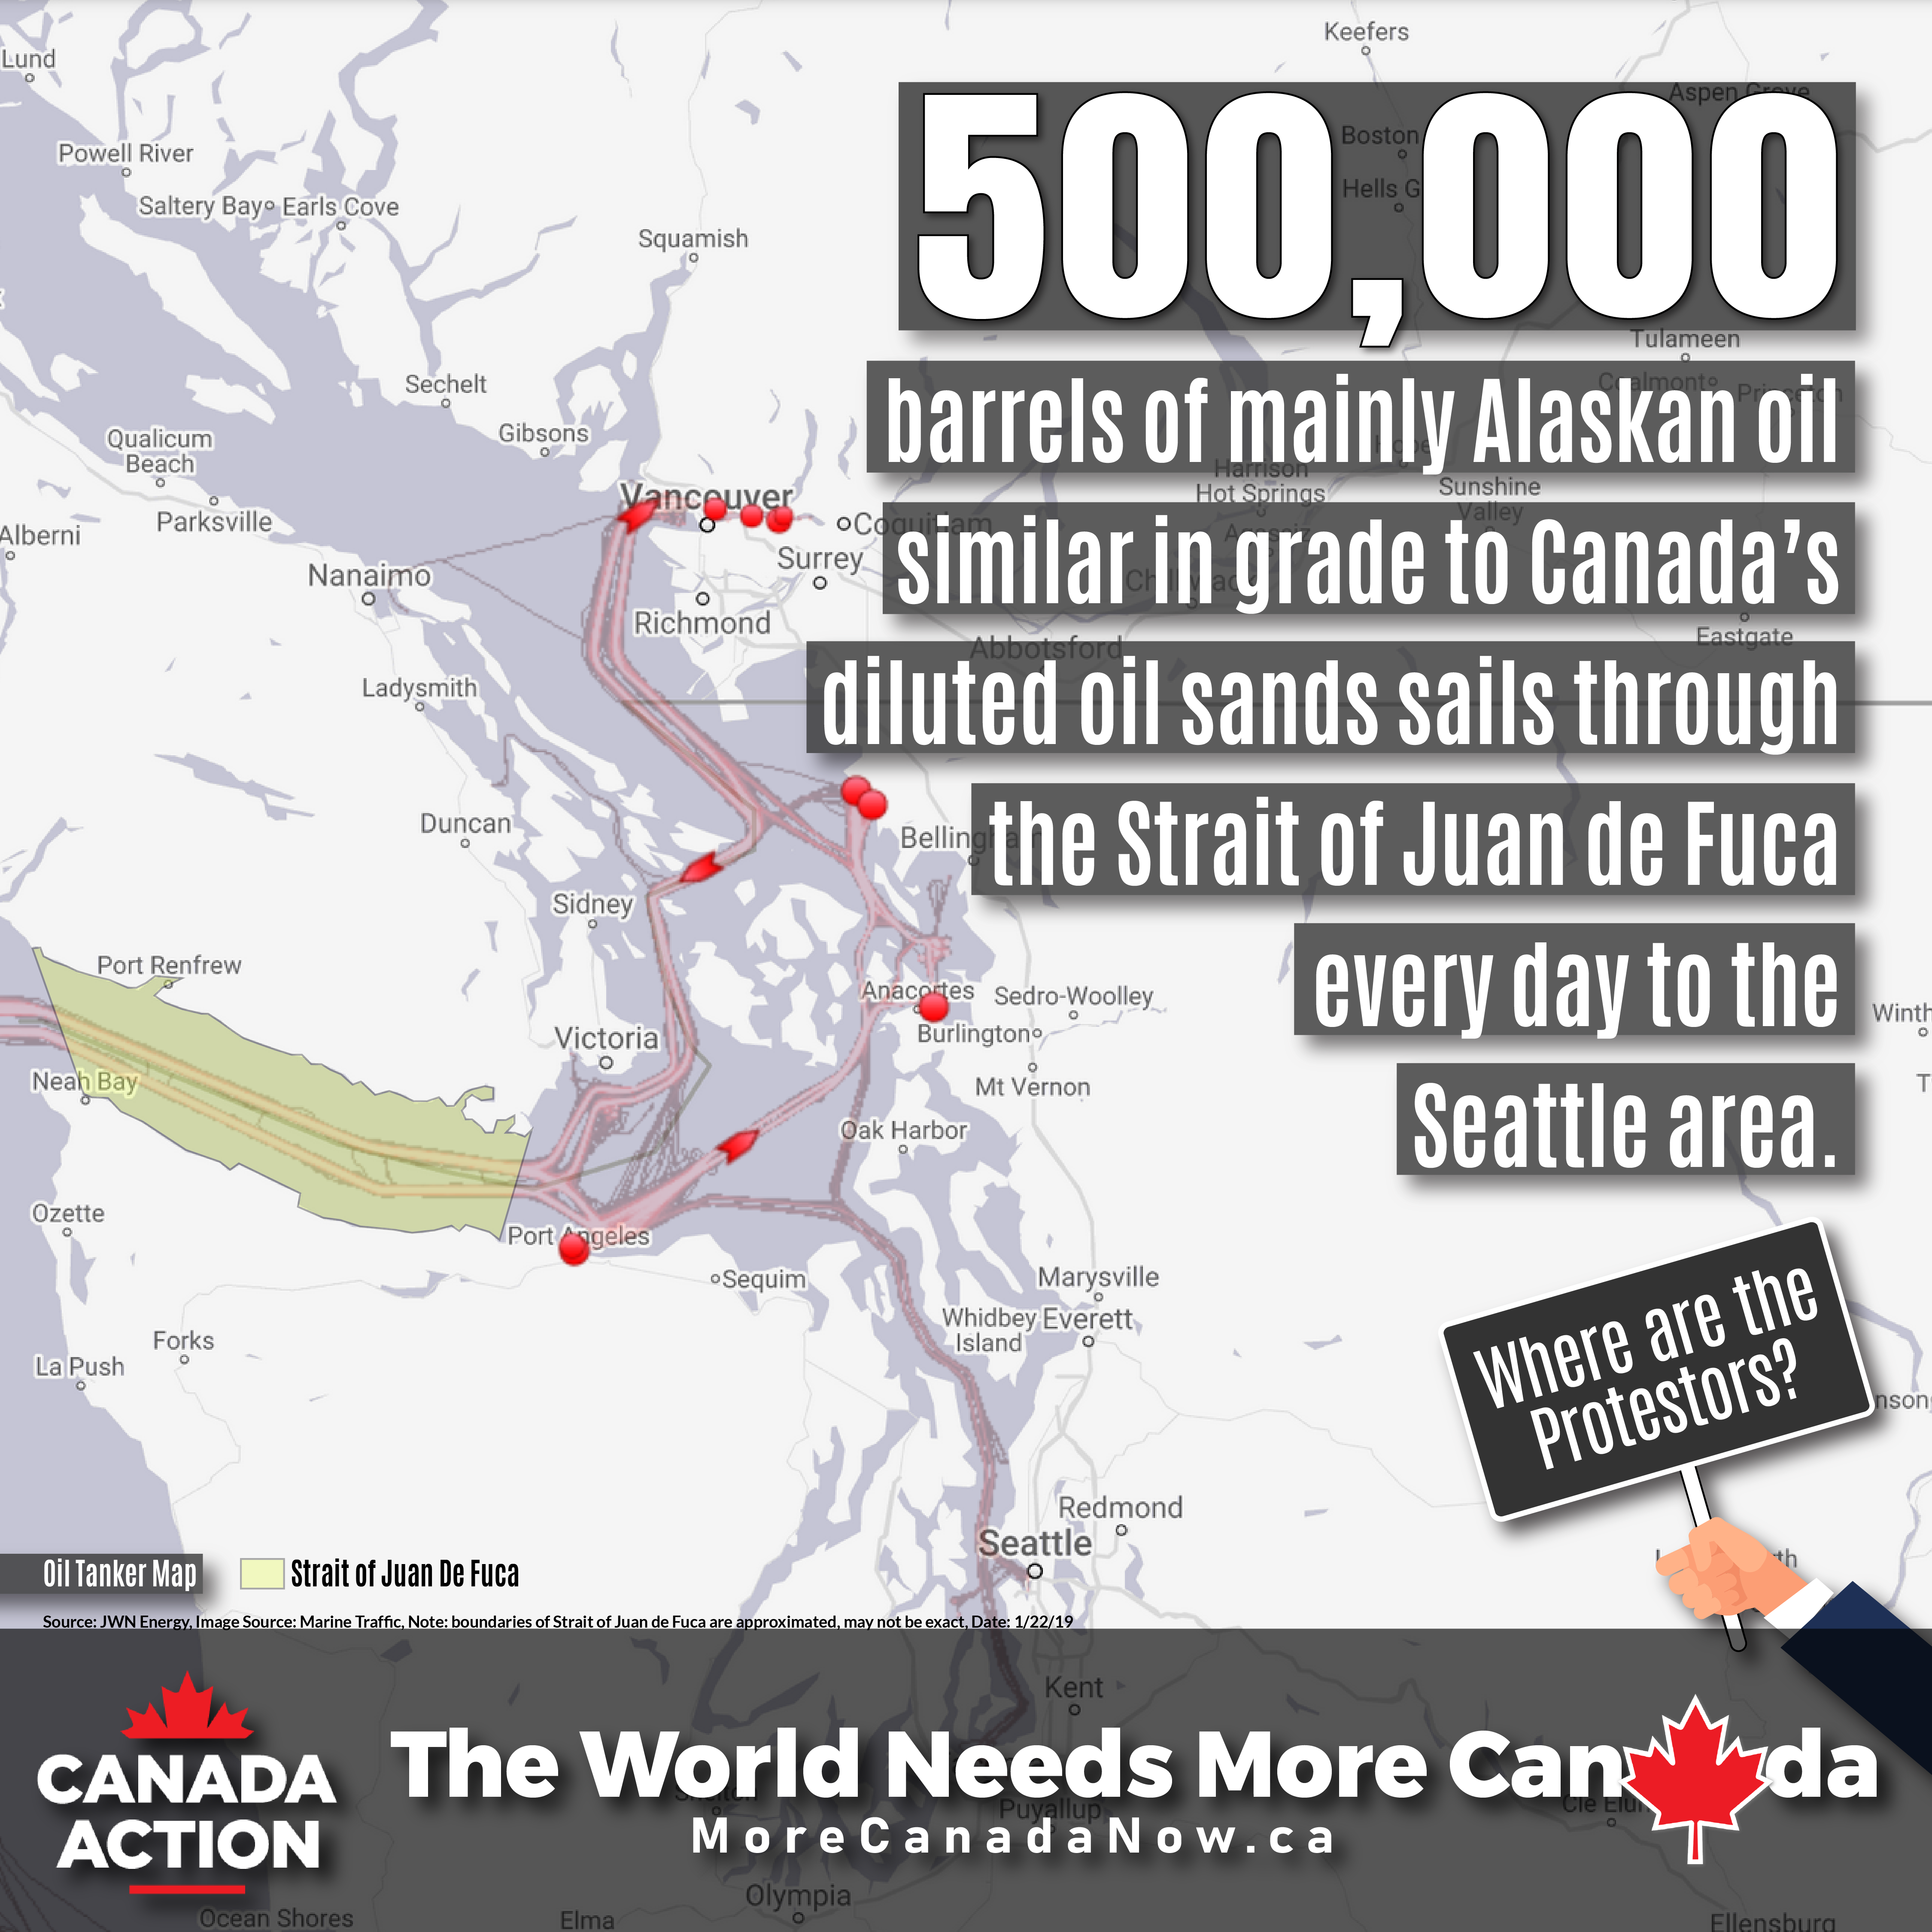 salish sea oil tankers crude oil every day